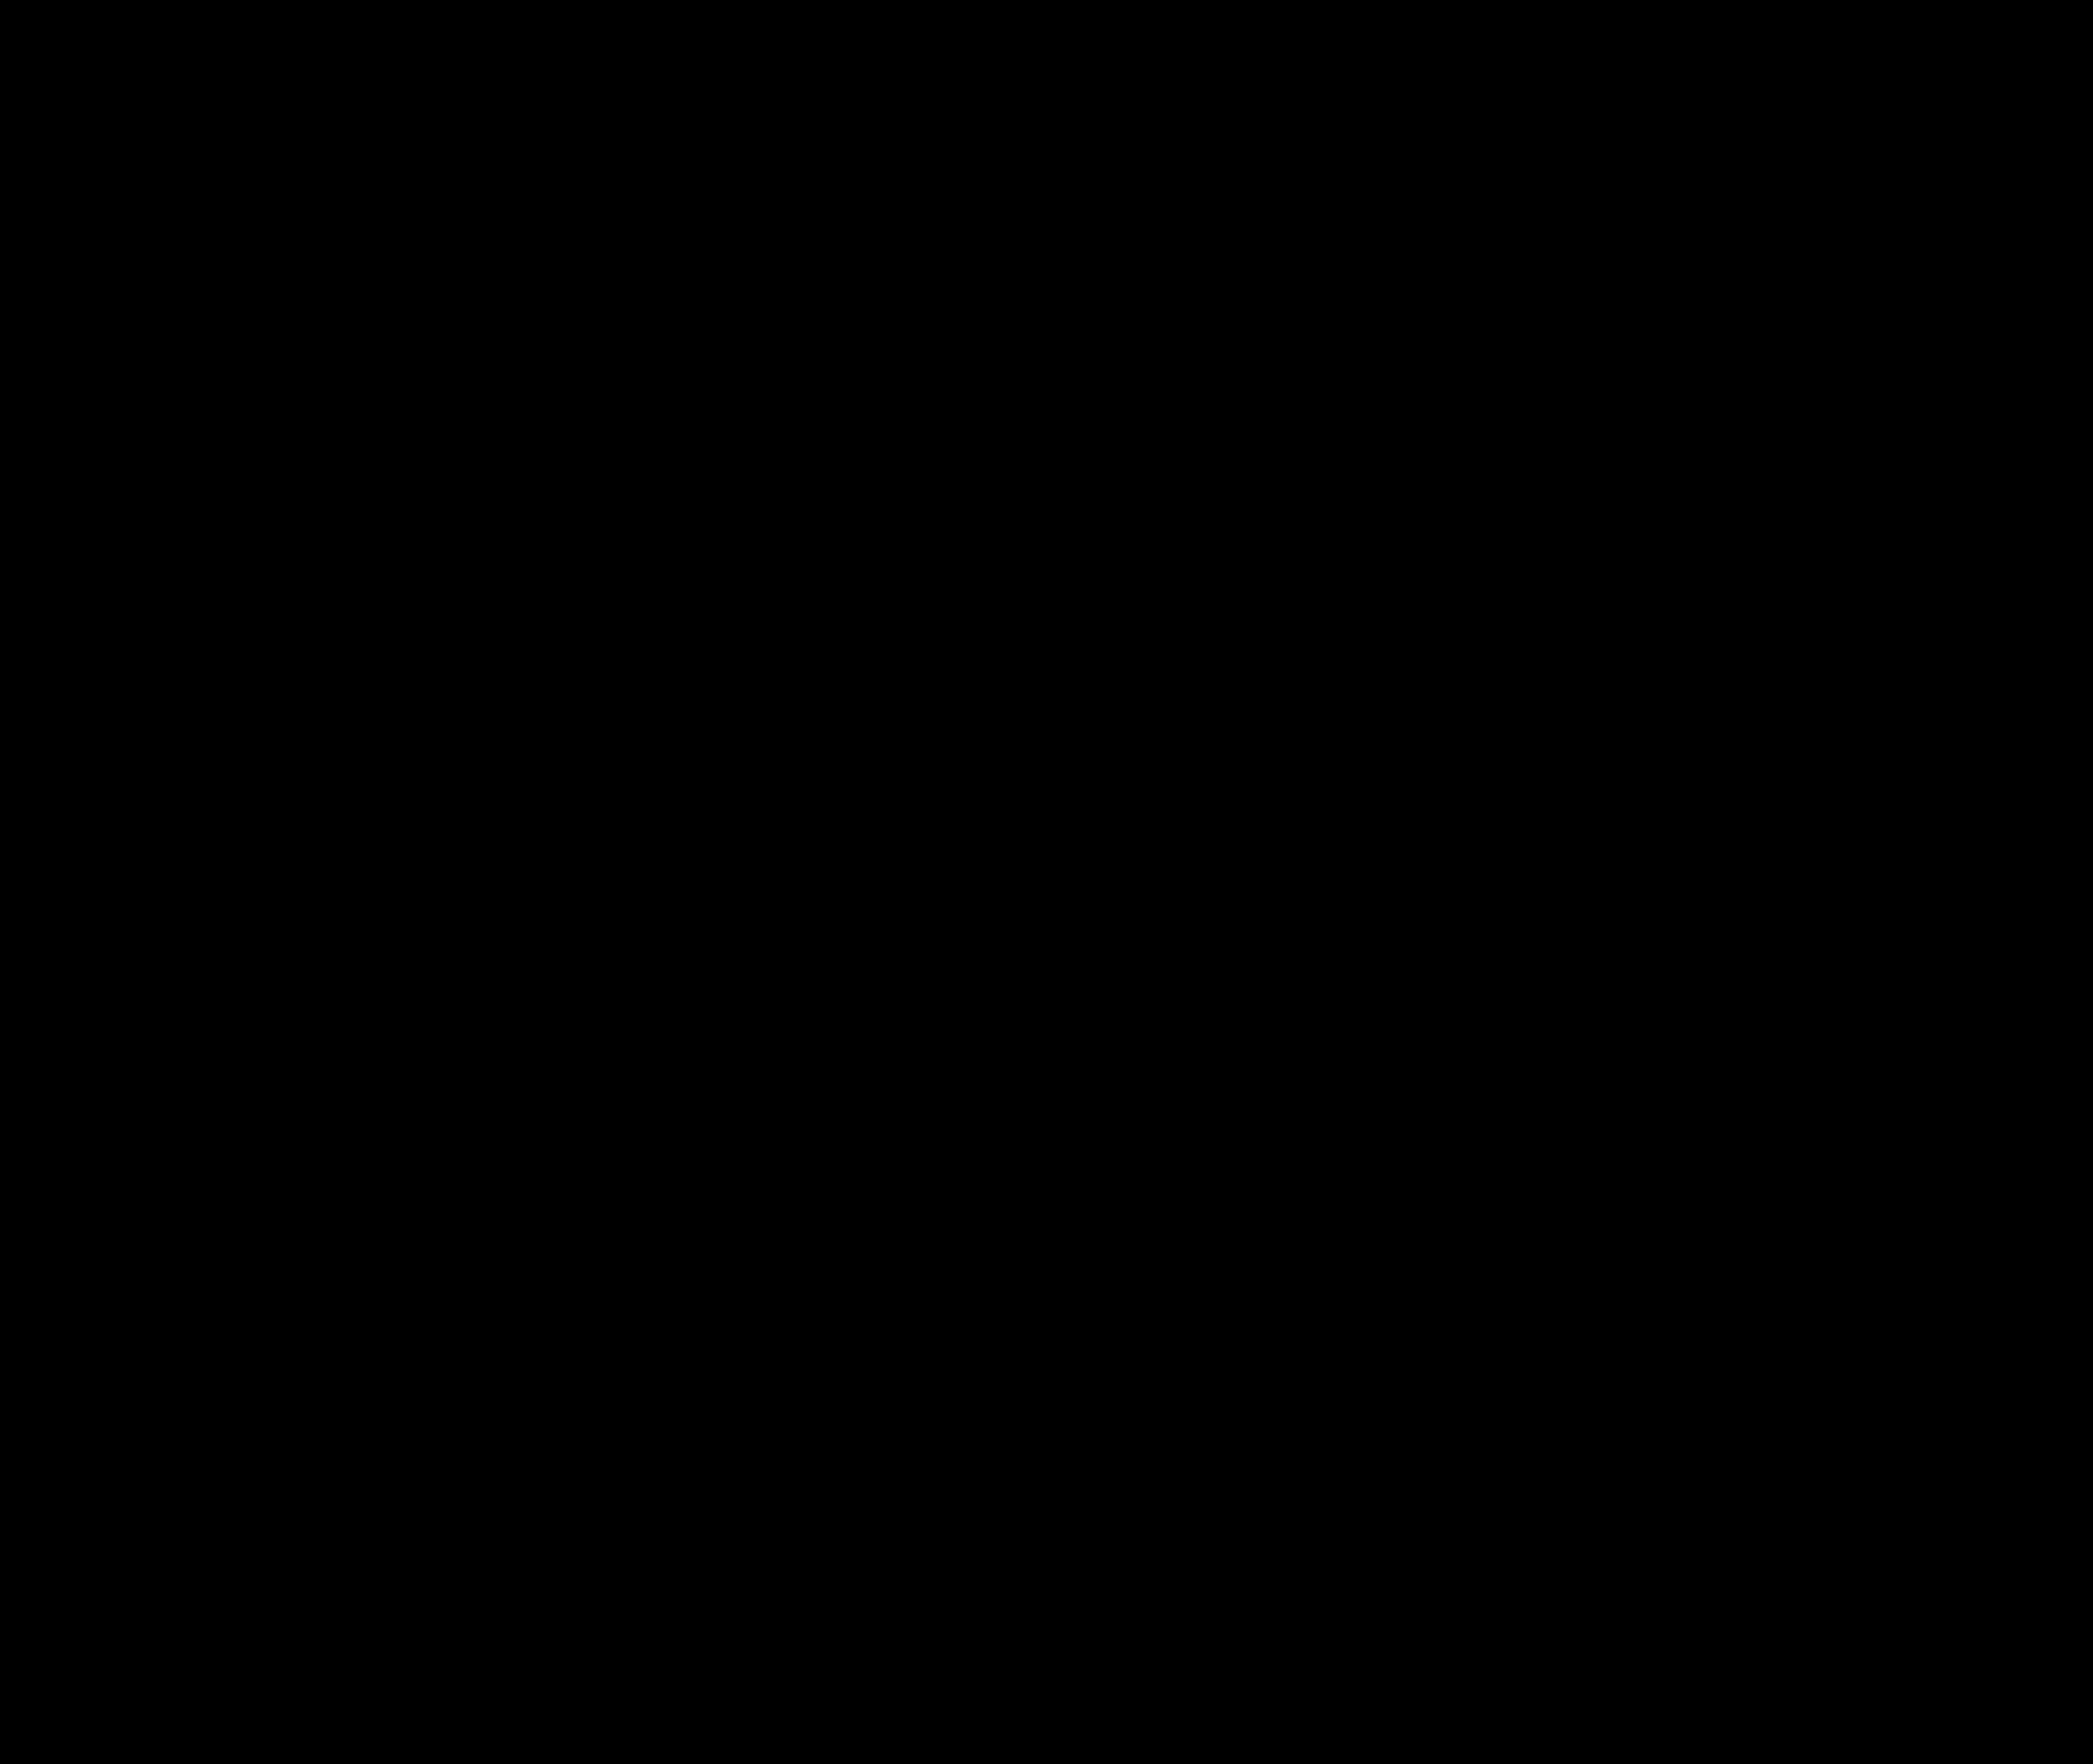 Camera clip art black and white. Clipart mobile big image